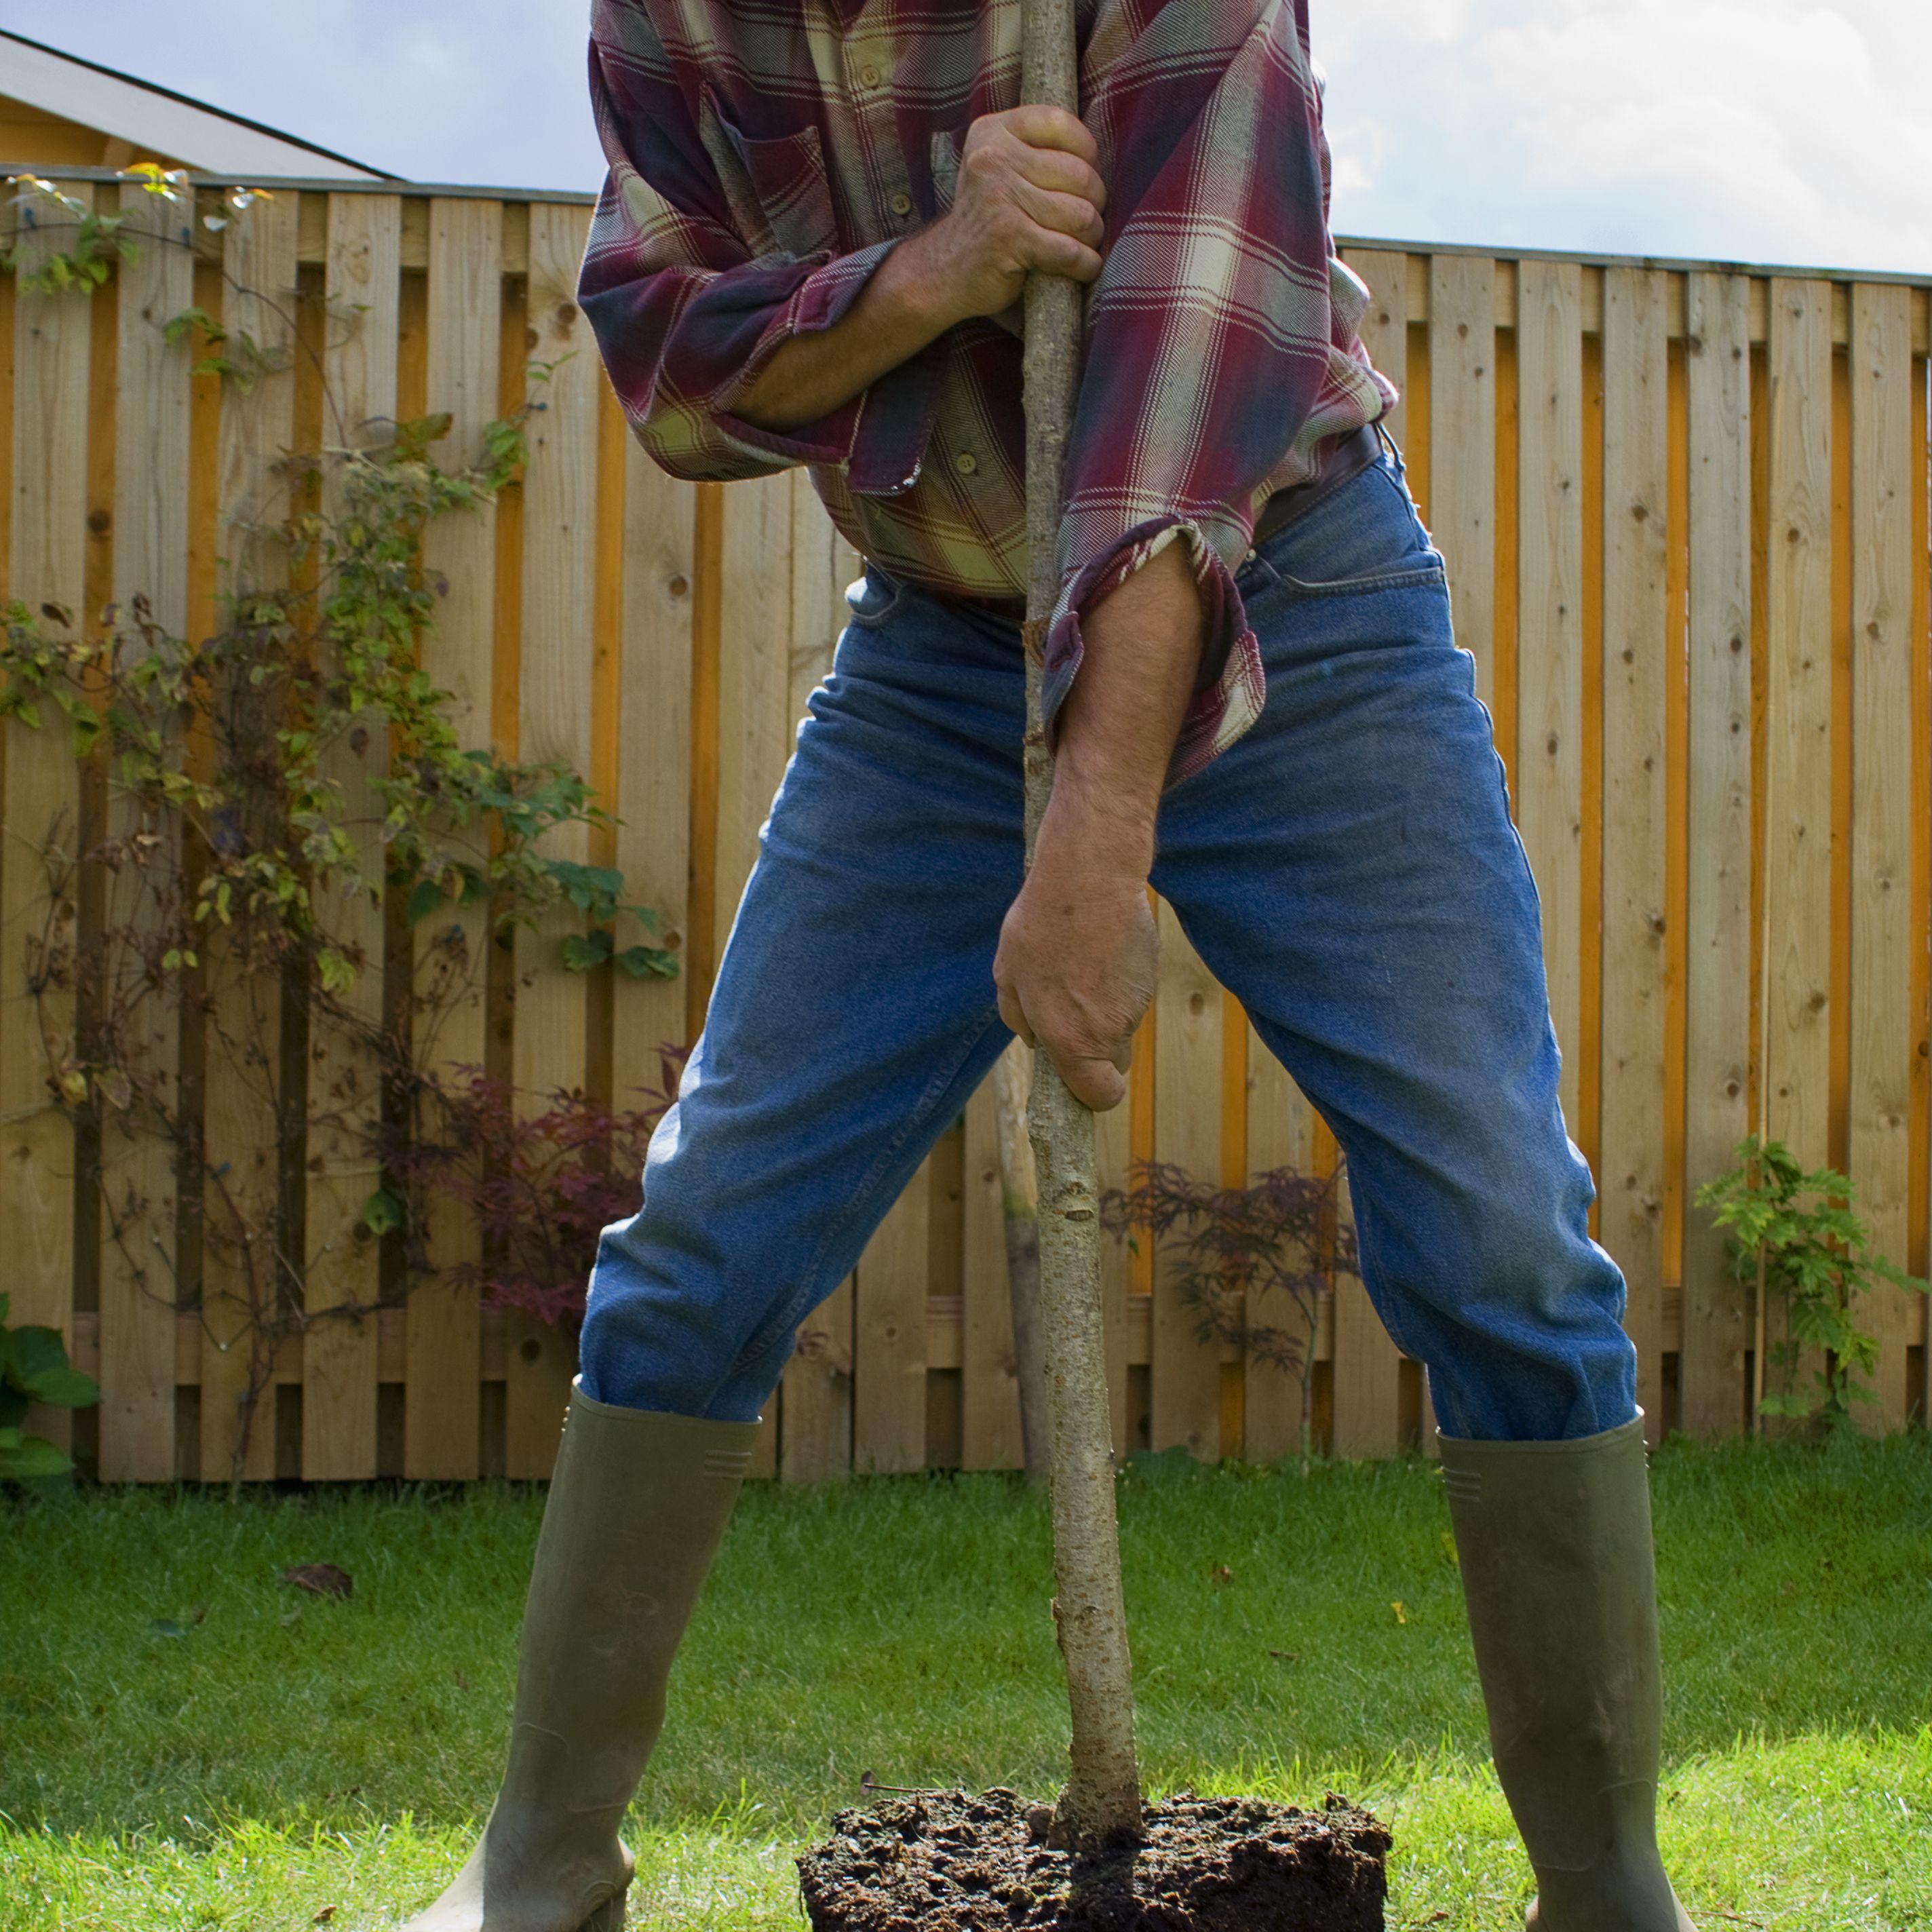 gardener transplanting young tree